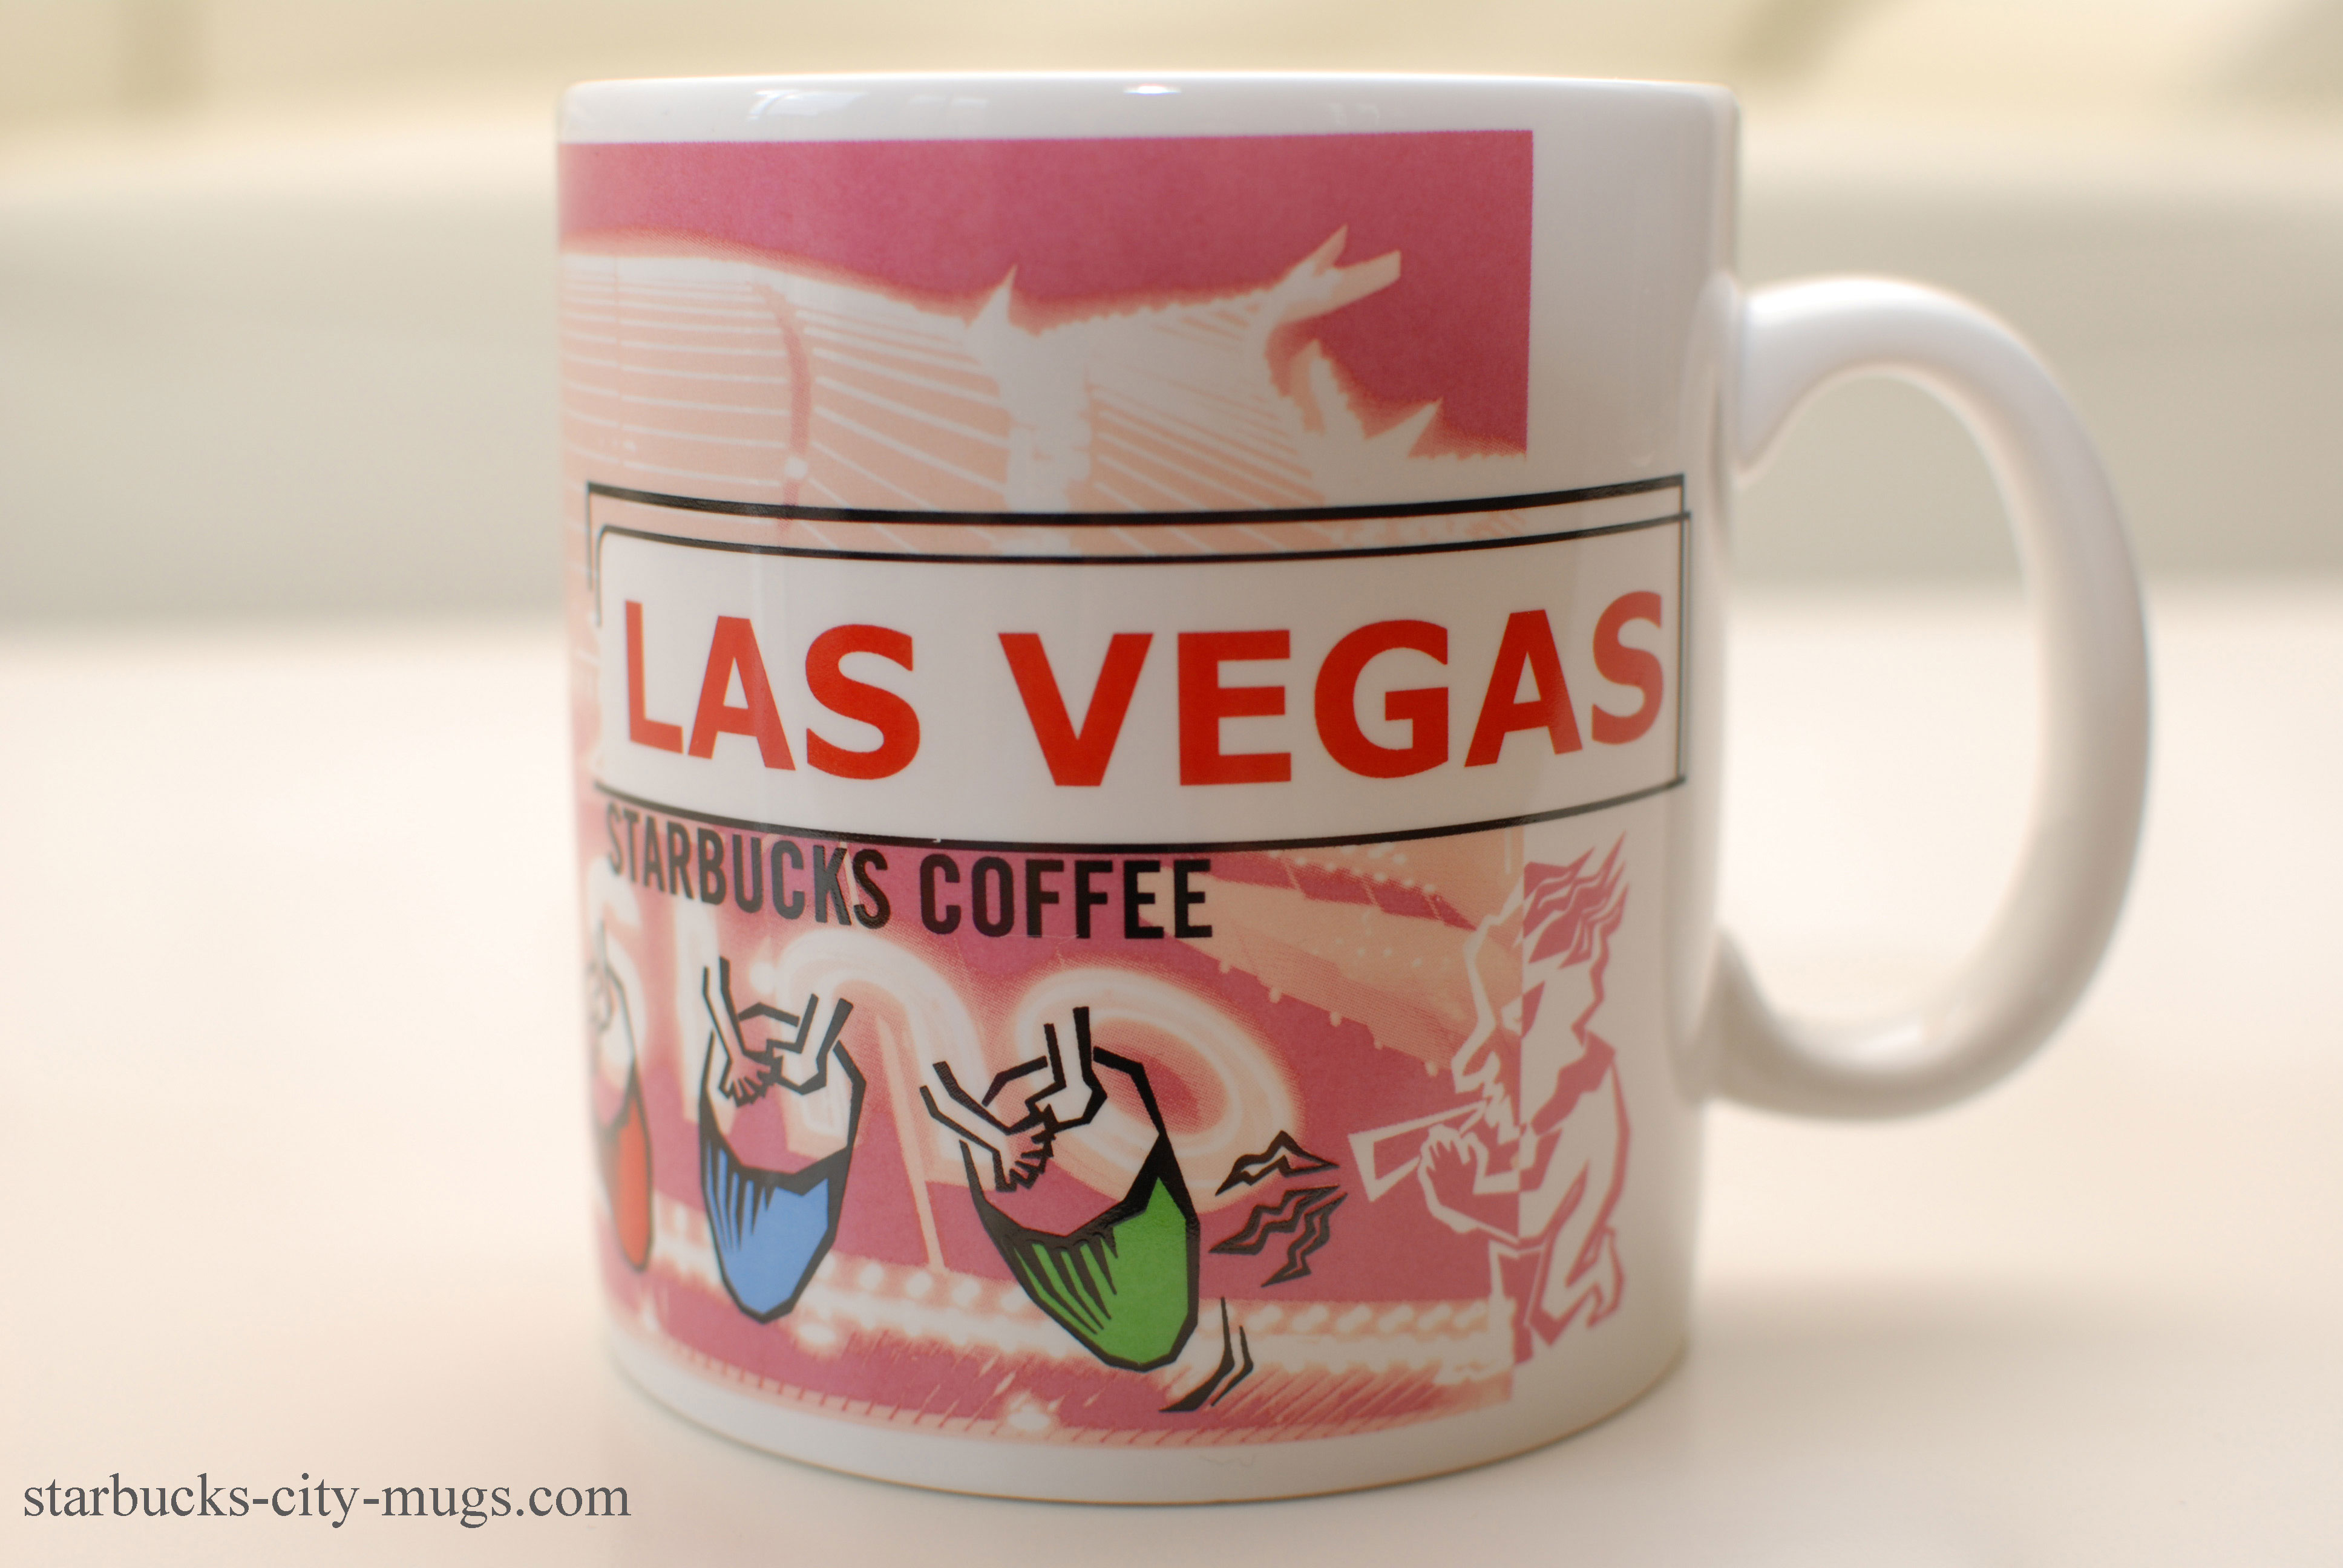 STARBUCKS LAS VEGAS You Are Here Mug Brand new in box - $ STARBUCKS Las Vegas You Are Here Mug Collection Brand new in box 14oz